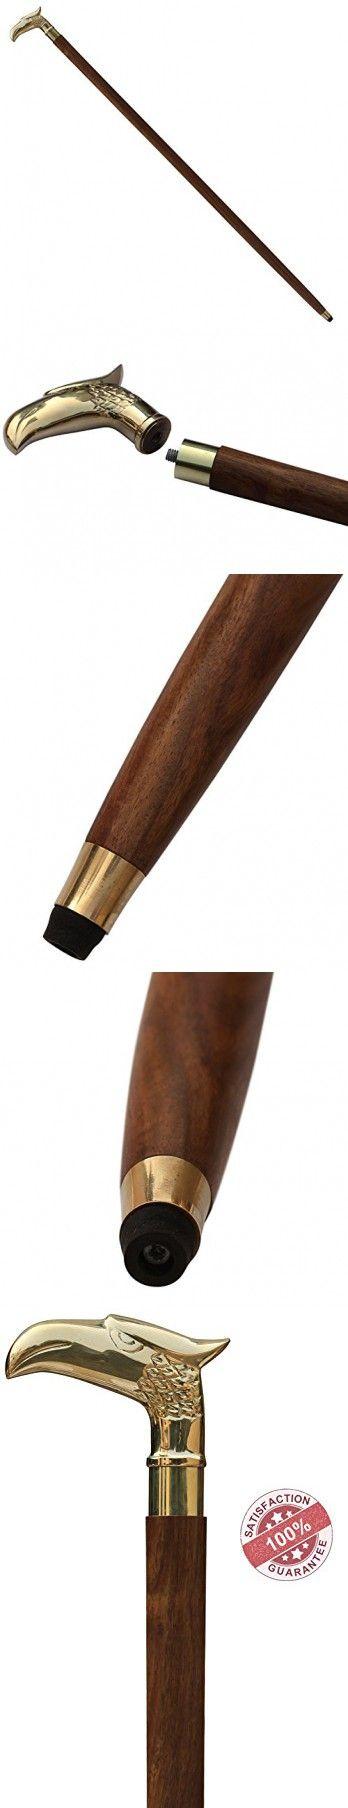 **Items on Sale** - Eagle Walking Stick - SouvNear Rare Eagle Head Wooden Cane Walking Stick for Men and Women - Canes and Walking Sticks with Metal Brass Handle                                                                                                                                                                                 More